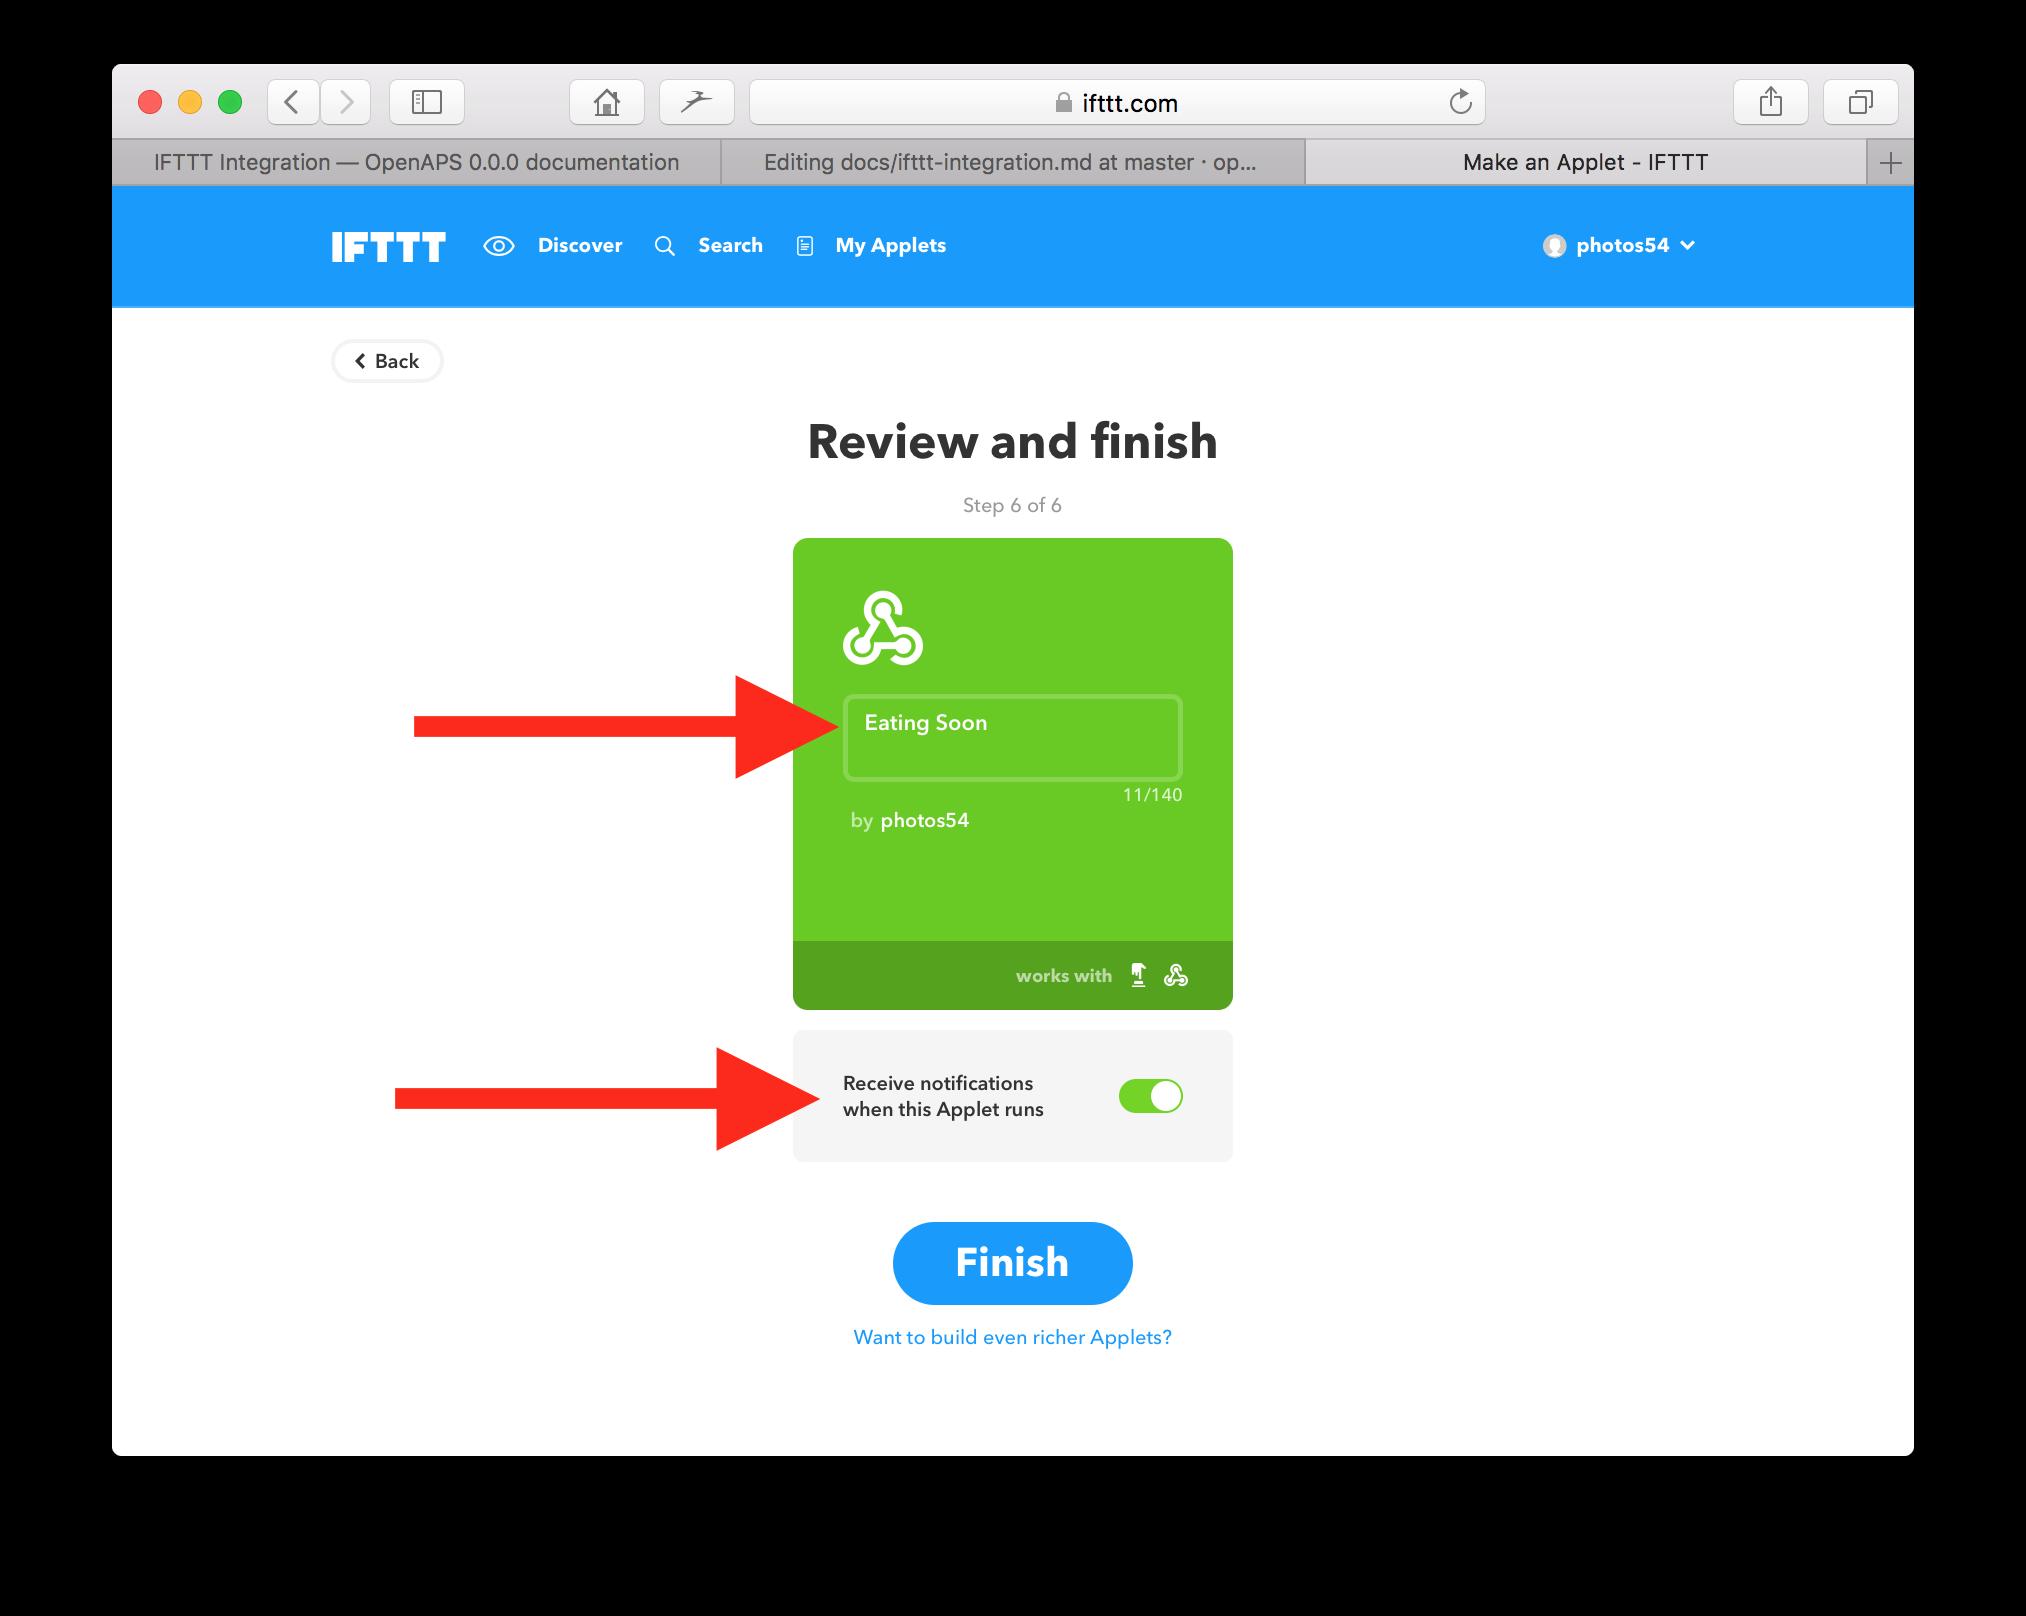 IFTTT Integration — OpenAPS 0 0 0 documentation